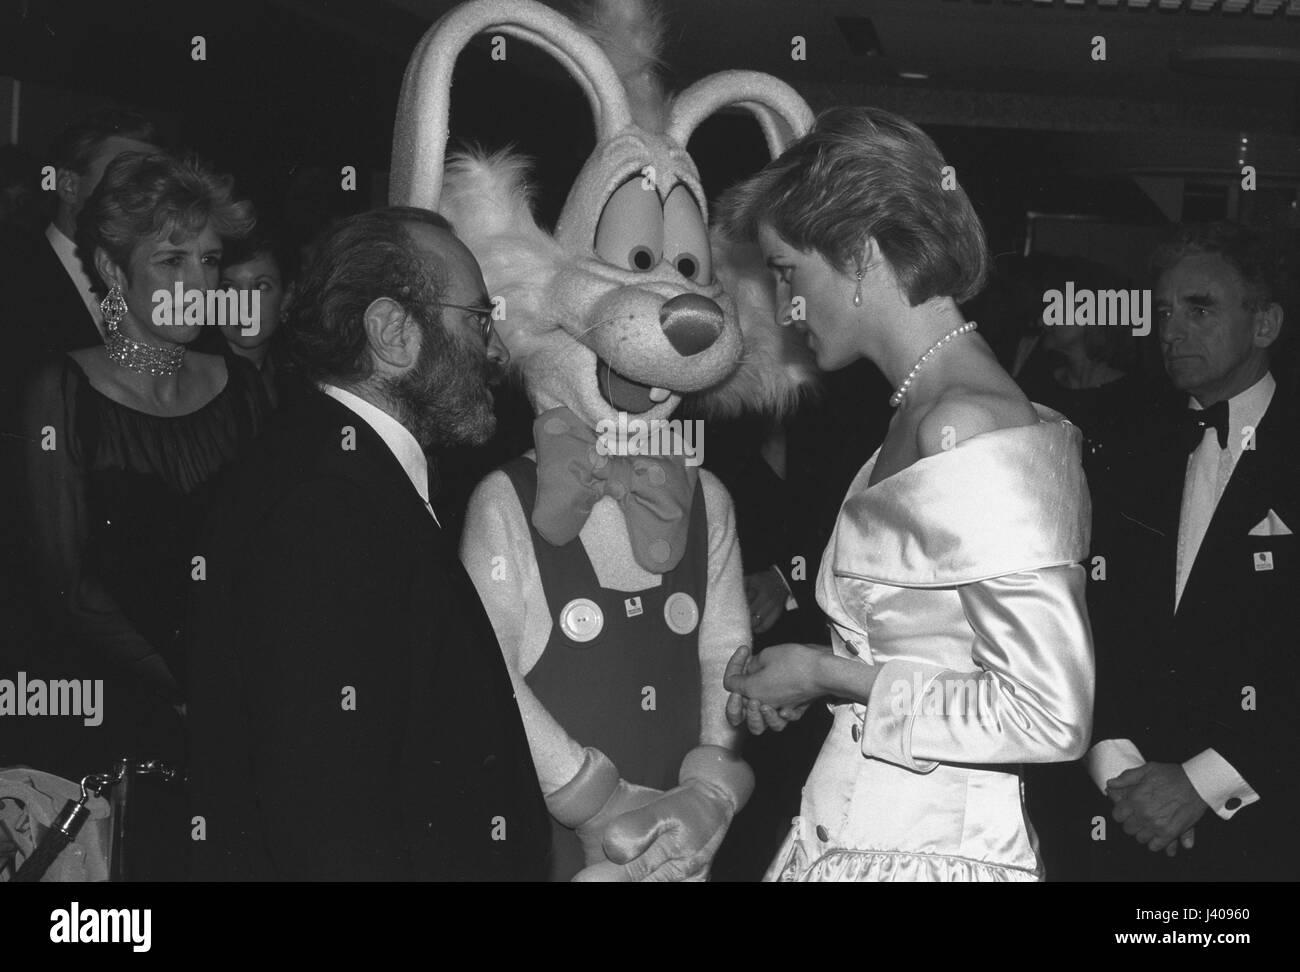 Ungewöhnlich Beobachten Who Framed Roger Rabbit Ideen ...